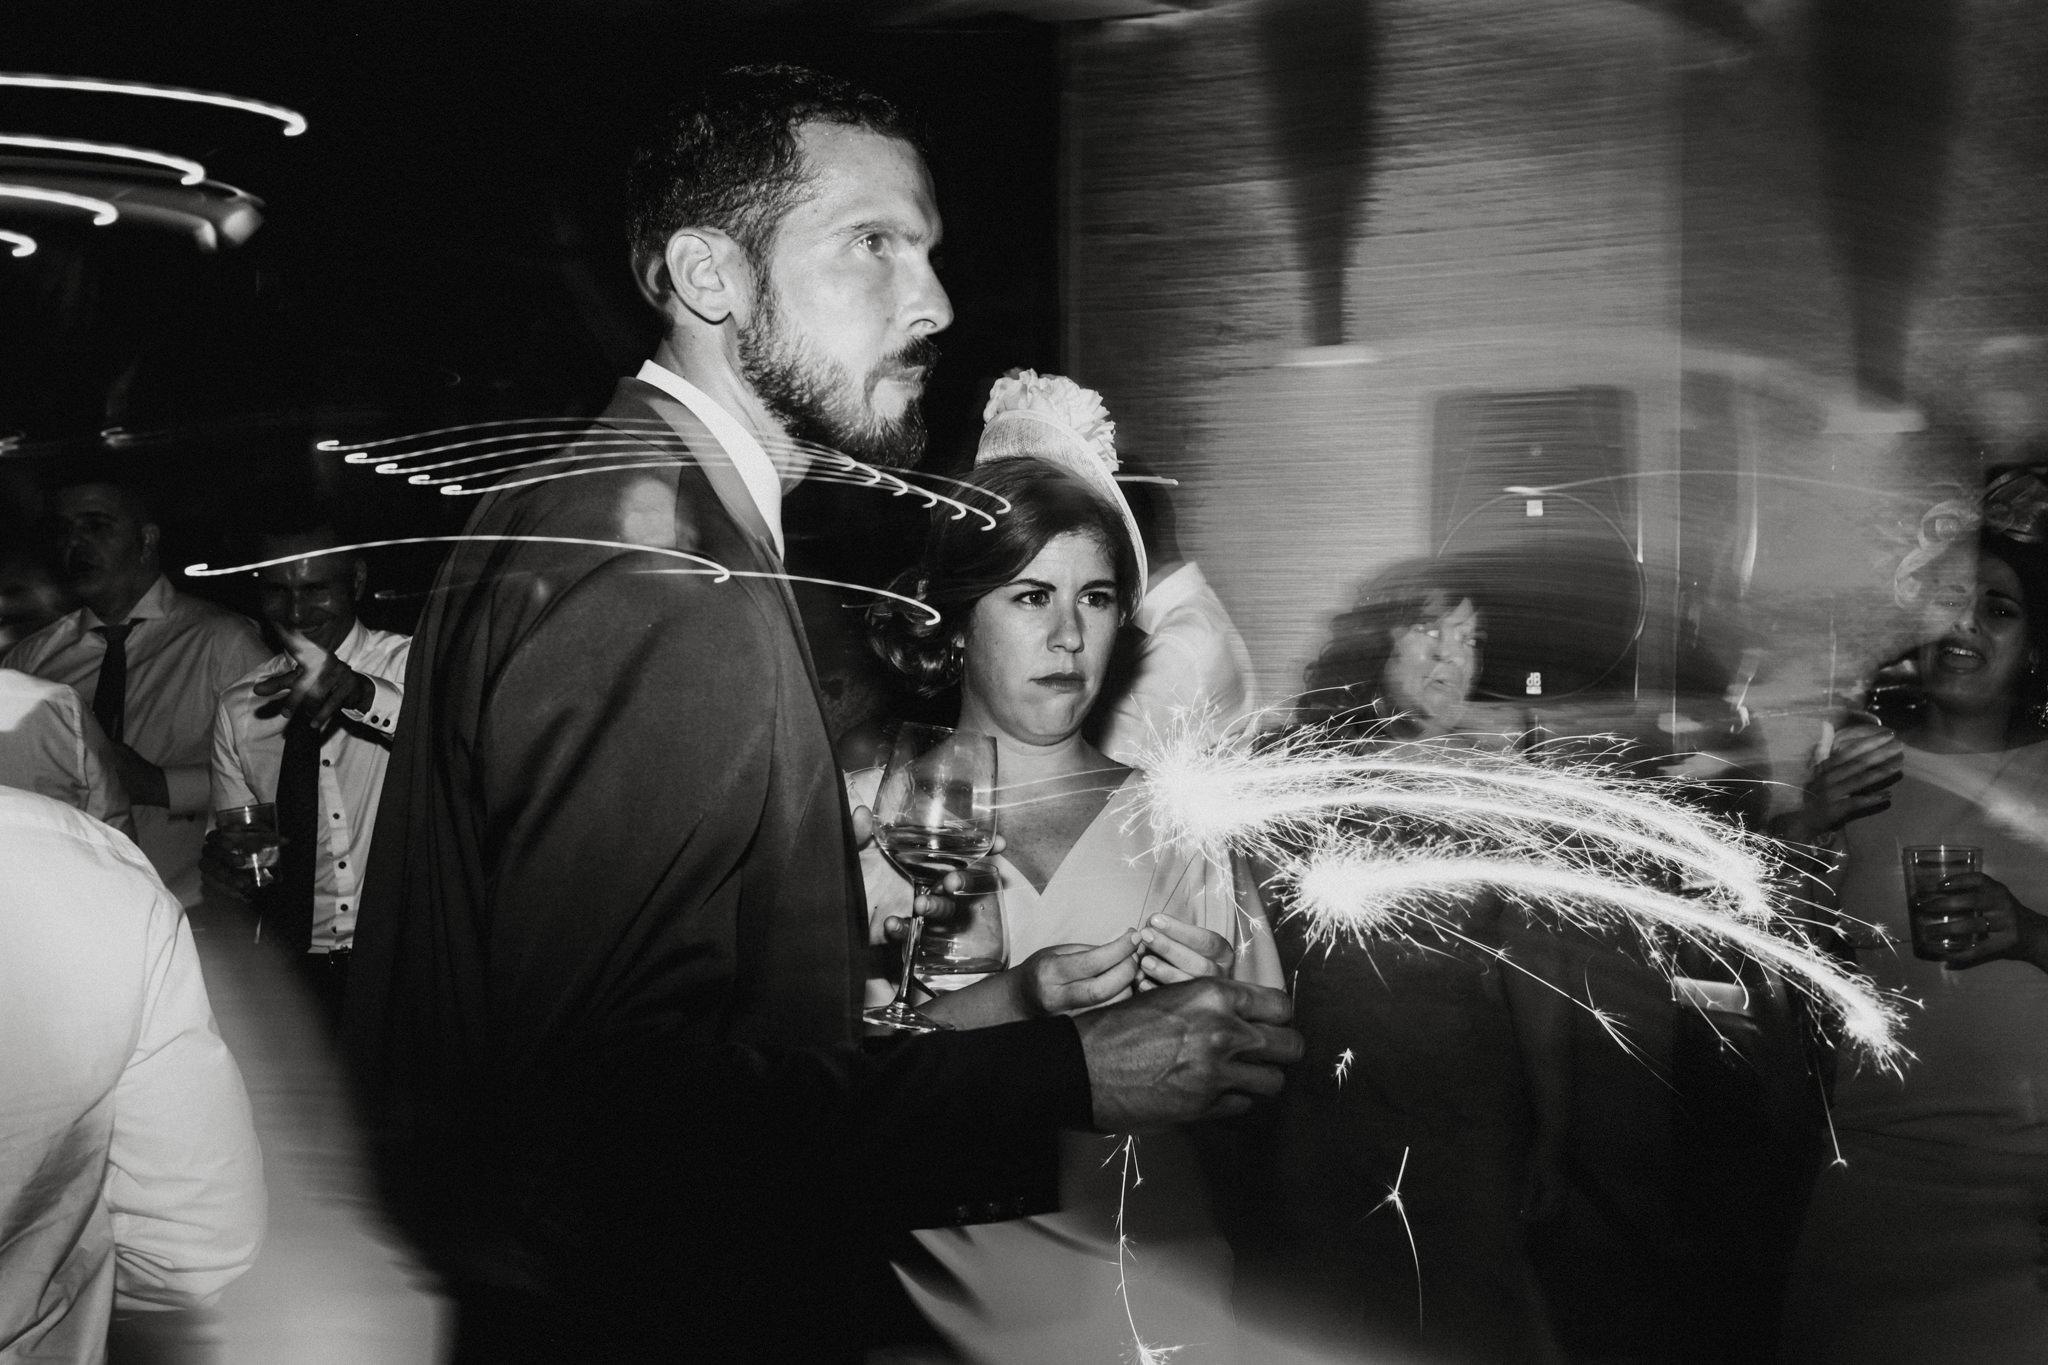 boda-diferente-fotografo-boda-laspalmas-grancanaria-93